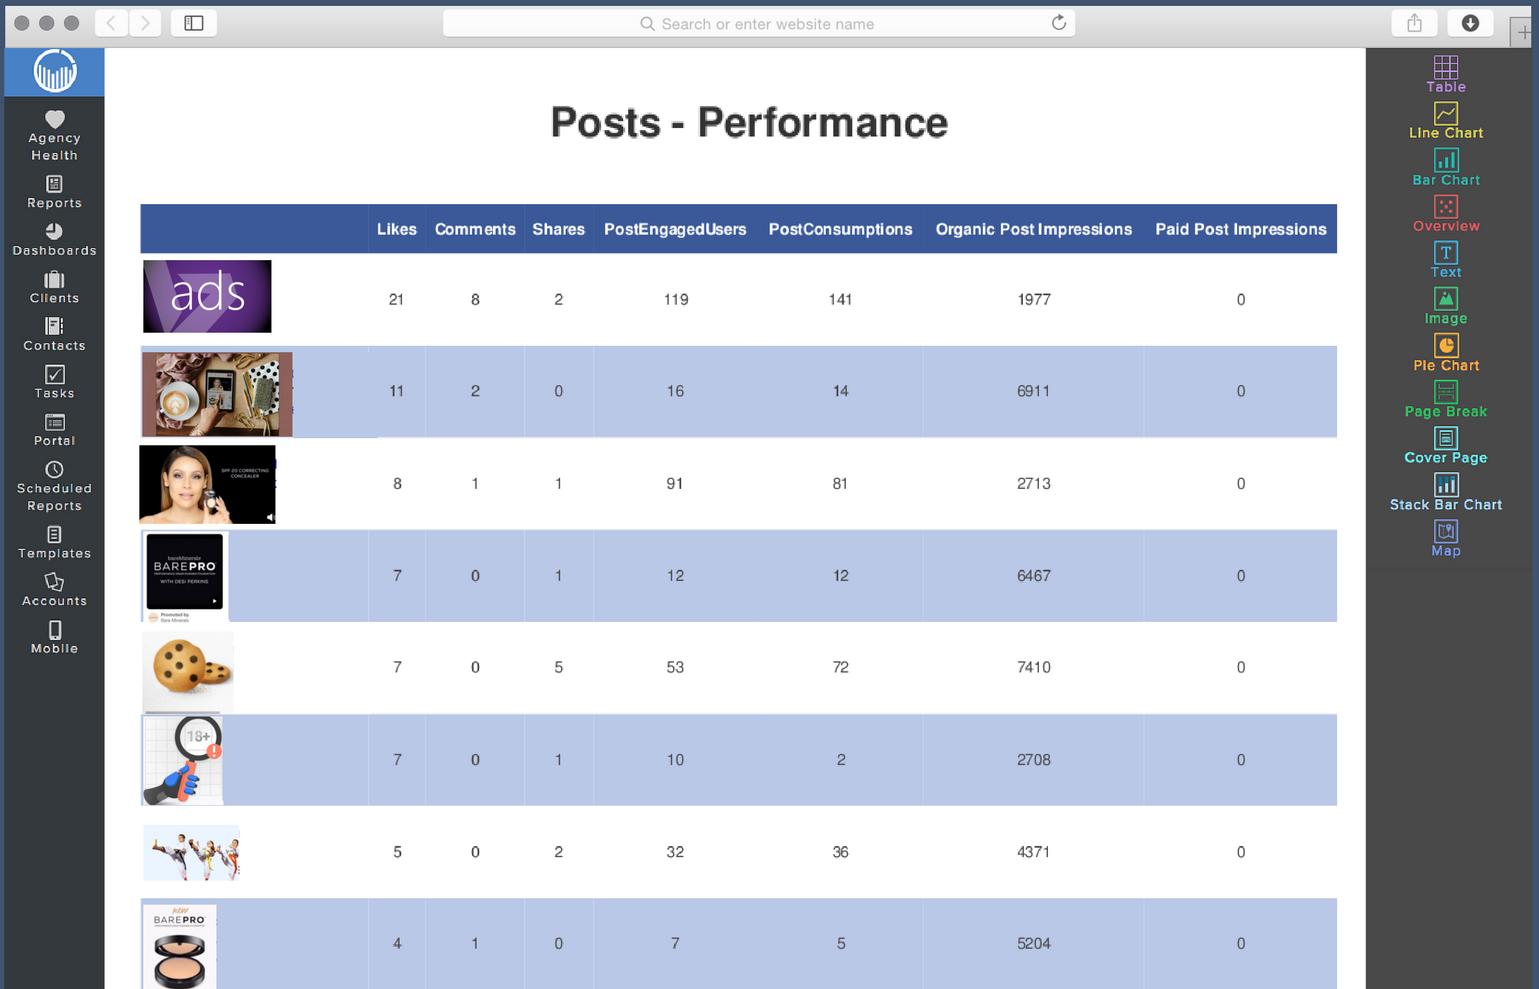 Social Media Report Template | Reportgarden Throughout Weekly Social Media Report Template